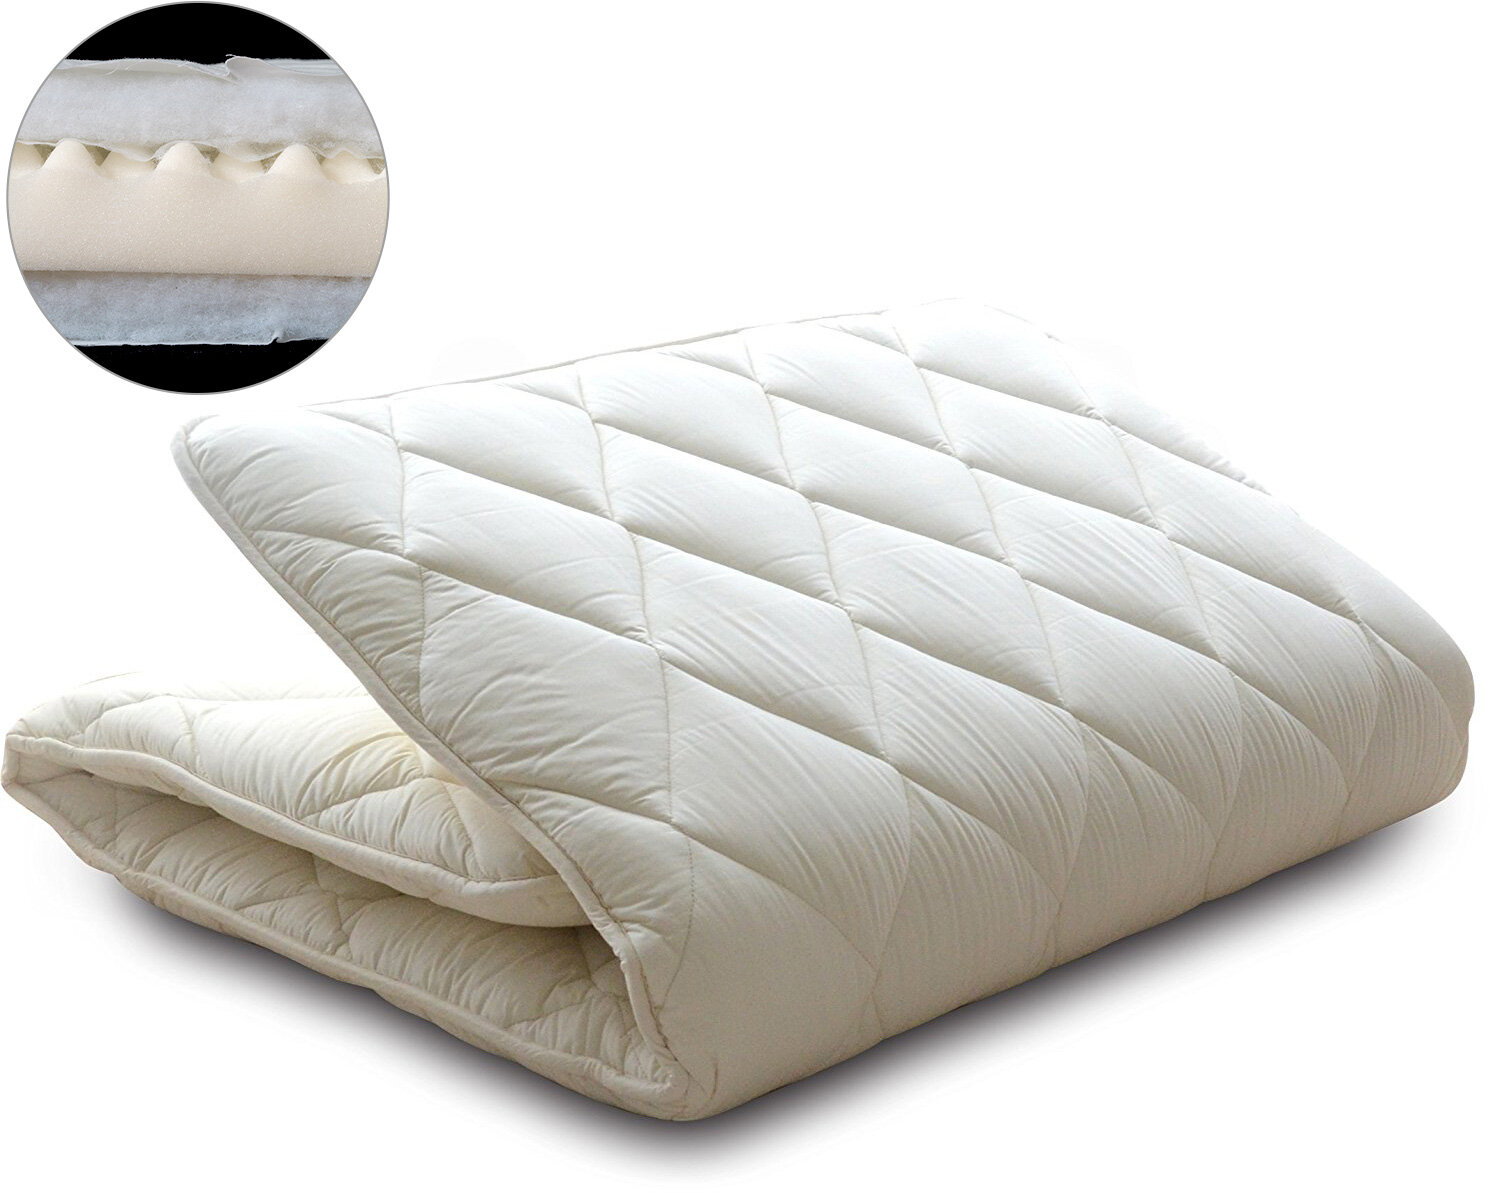 Solis Japanese Cotton Futon Mattress